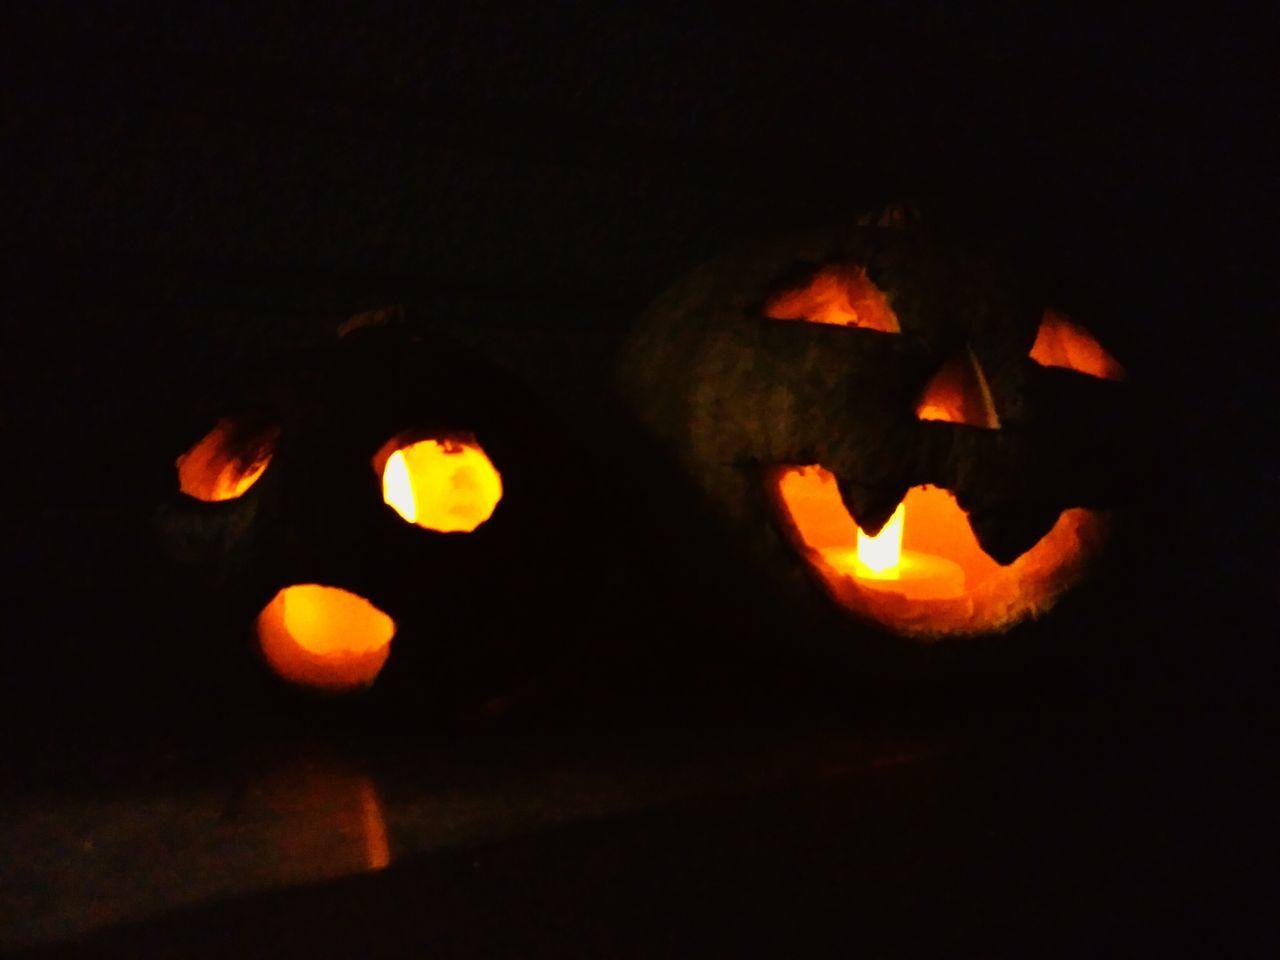 pumpkin, halloween, night, celebration, orange color, illuminated, no people, jack o lantern, anthropomorphic face, close-up, indoors